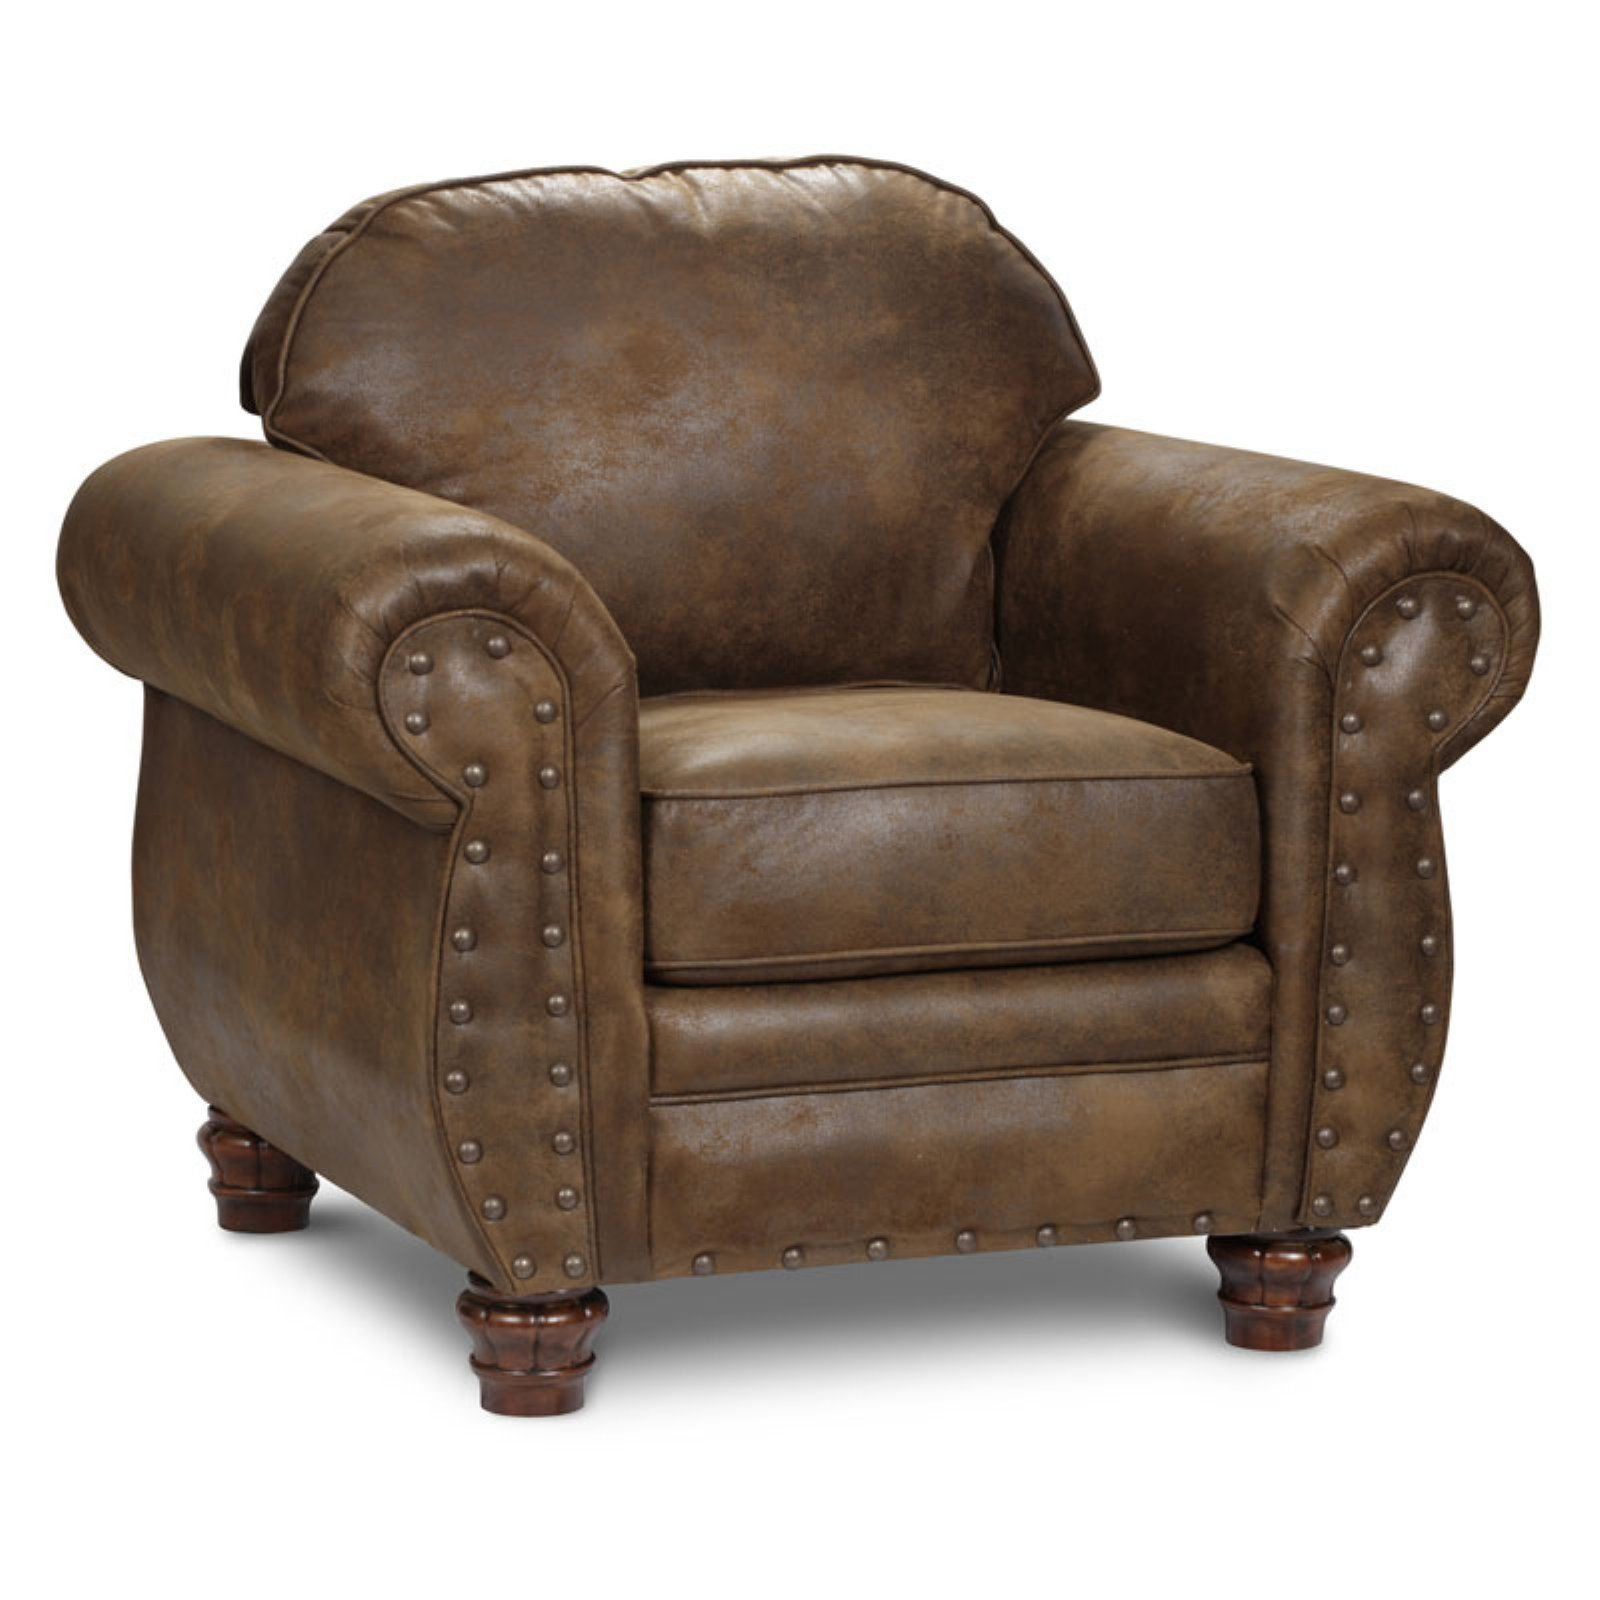 American Furniture Classics Sedona Accent Chair American Furniture Upholstered Arm Chair Furniture